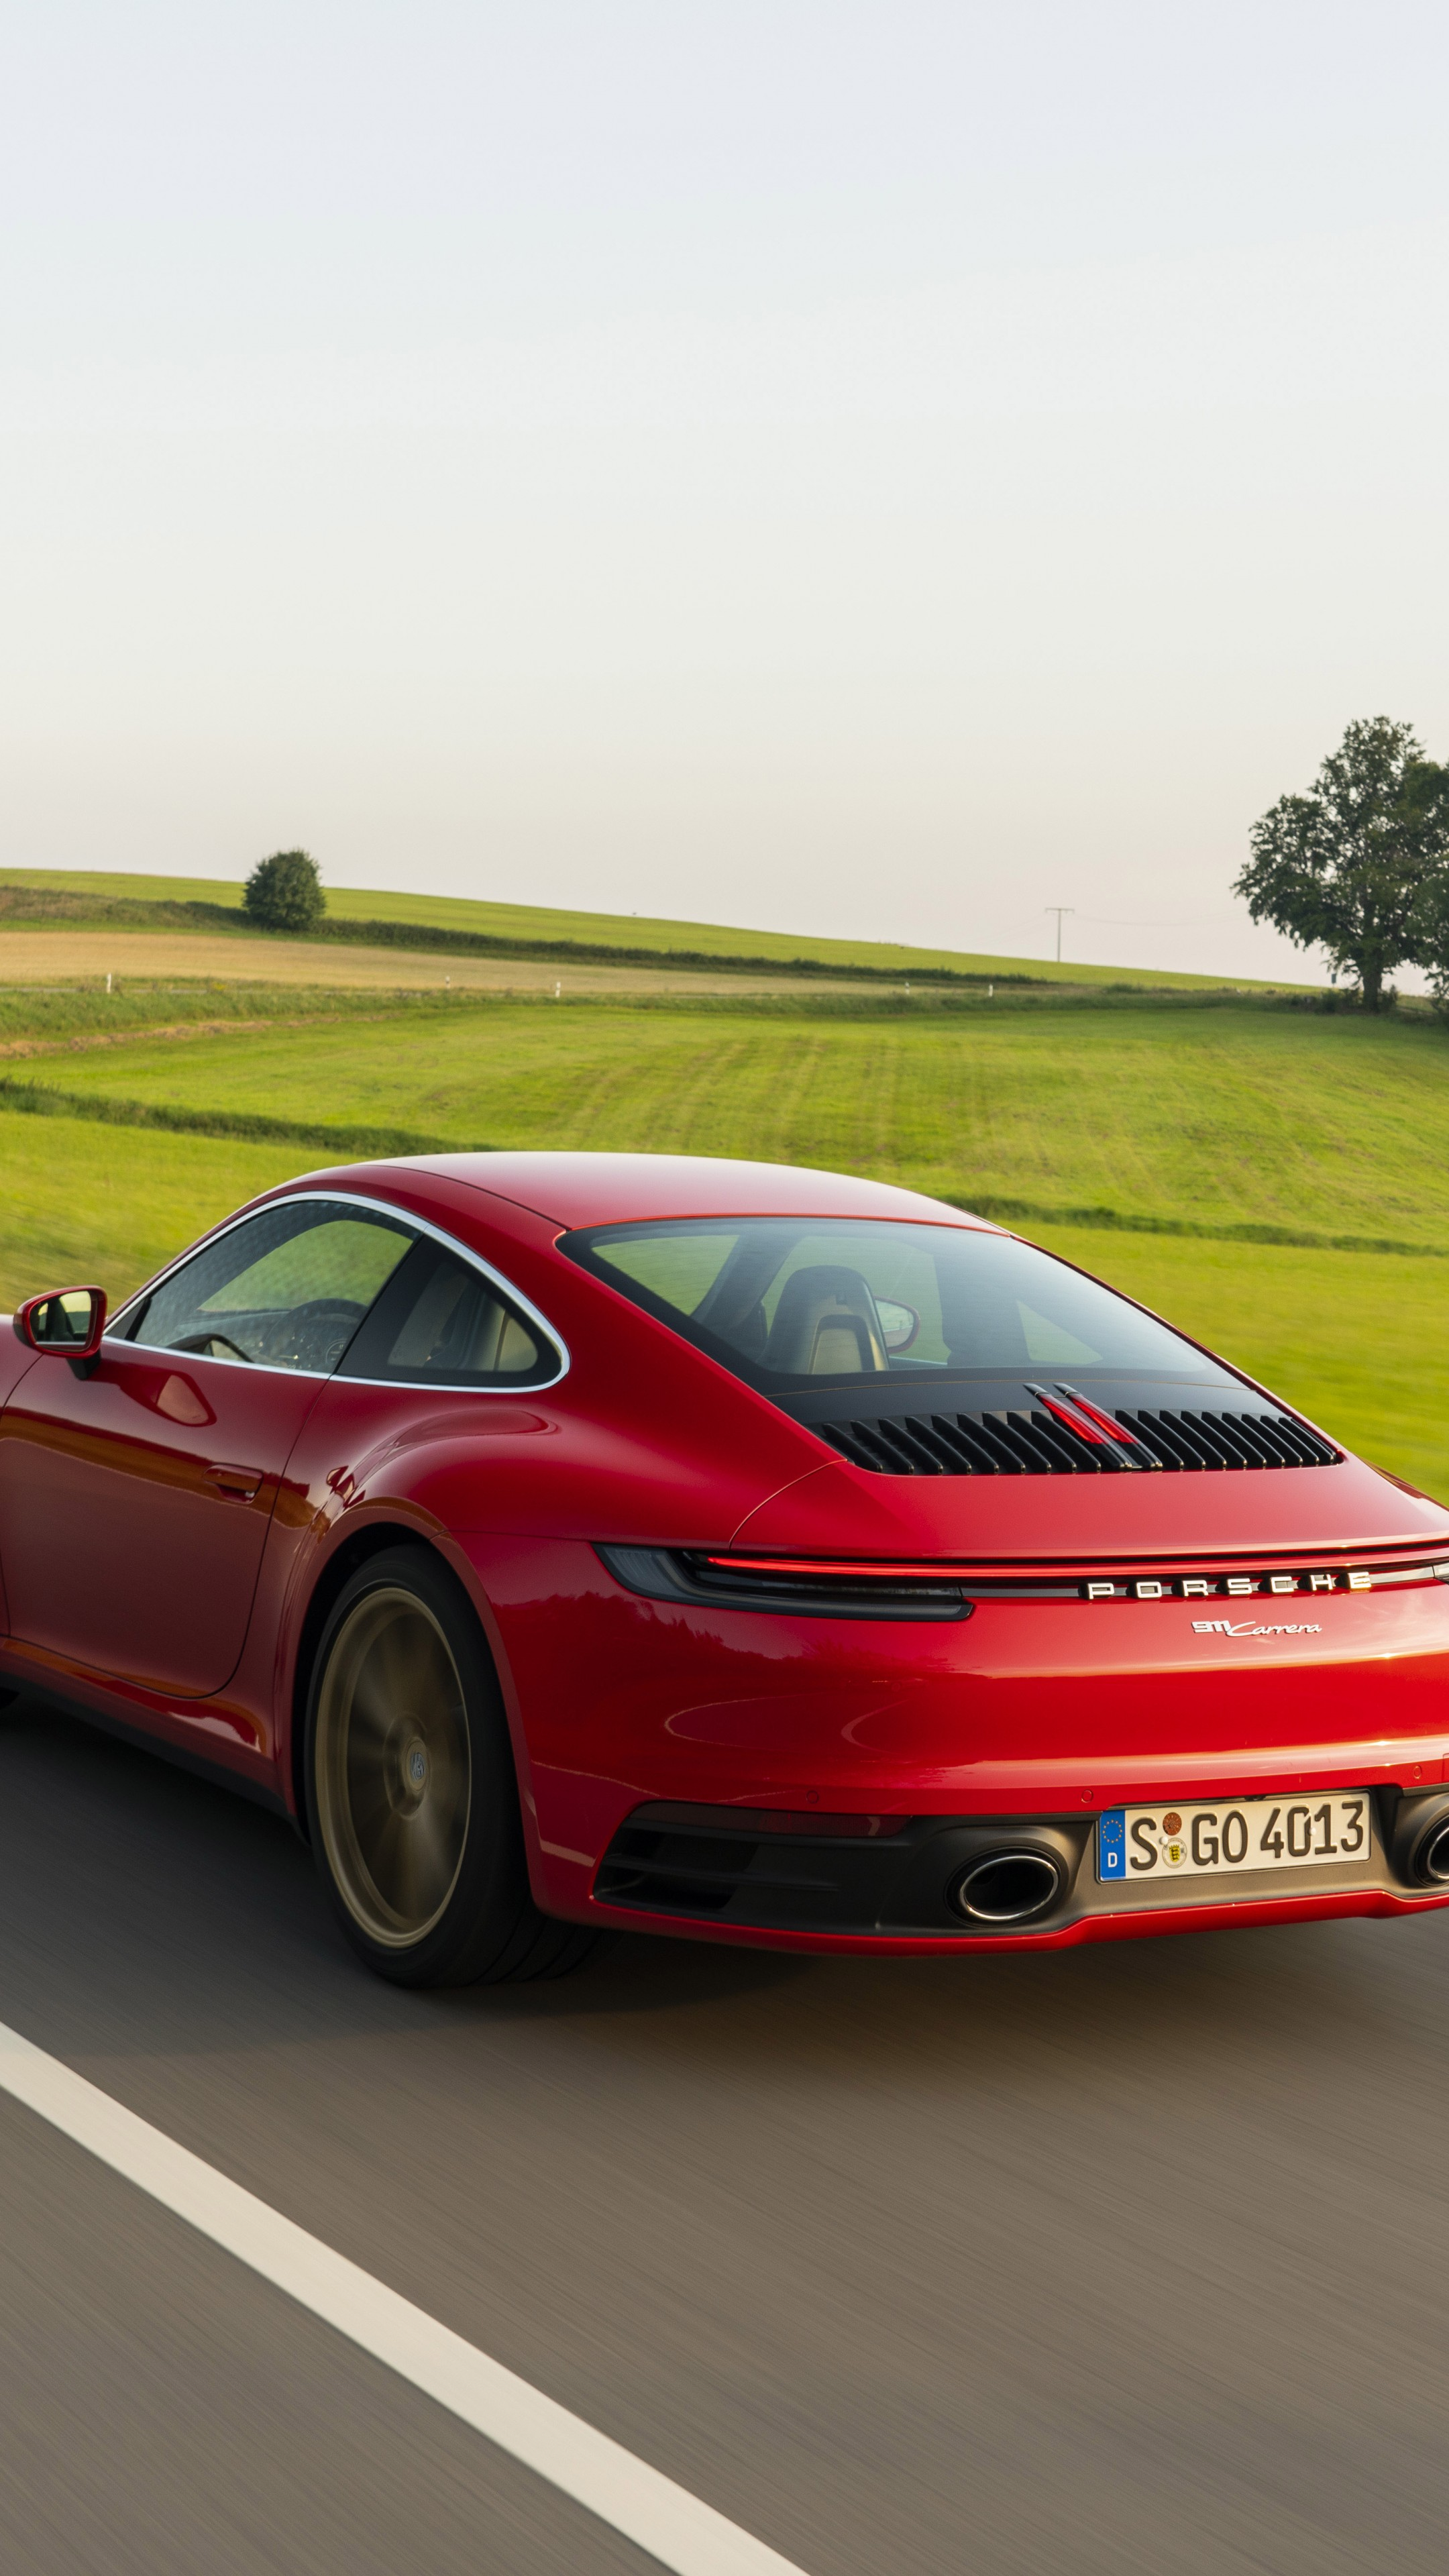 Wallpaper Porsche 911 922 Carrera Coupe 2020 cars 5K Cars 2160x3840